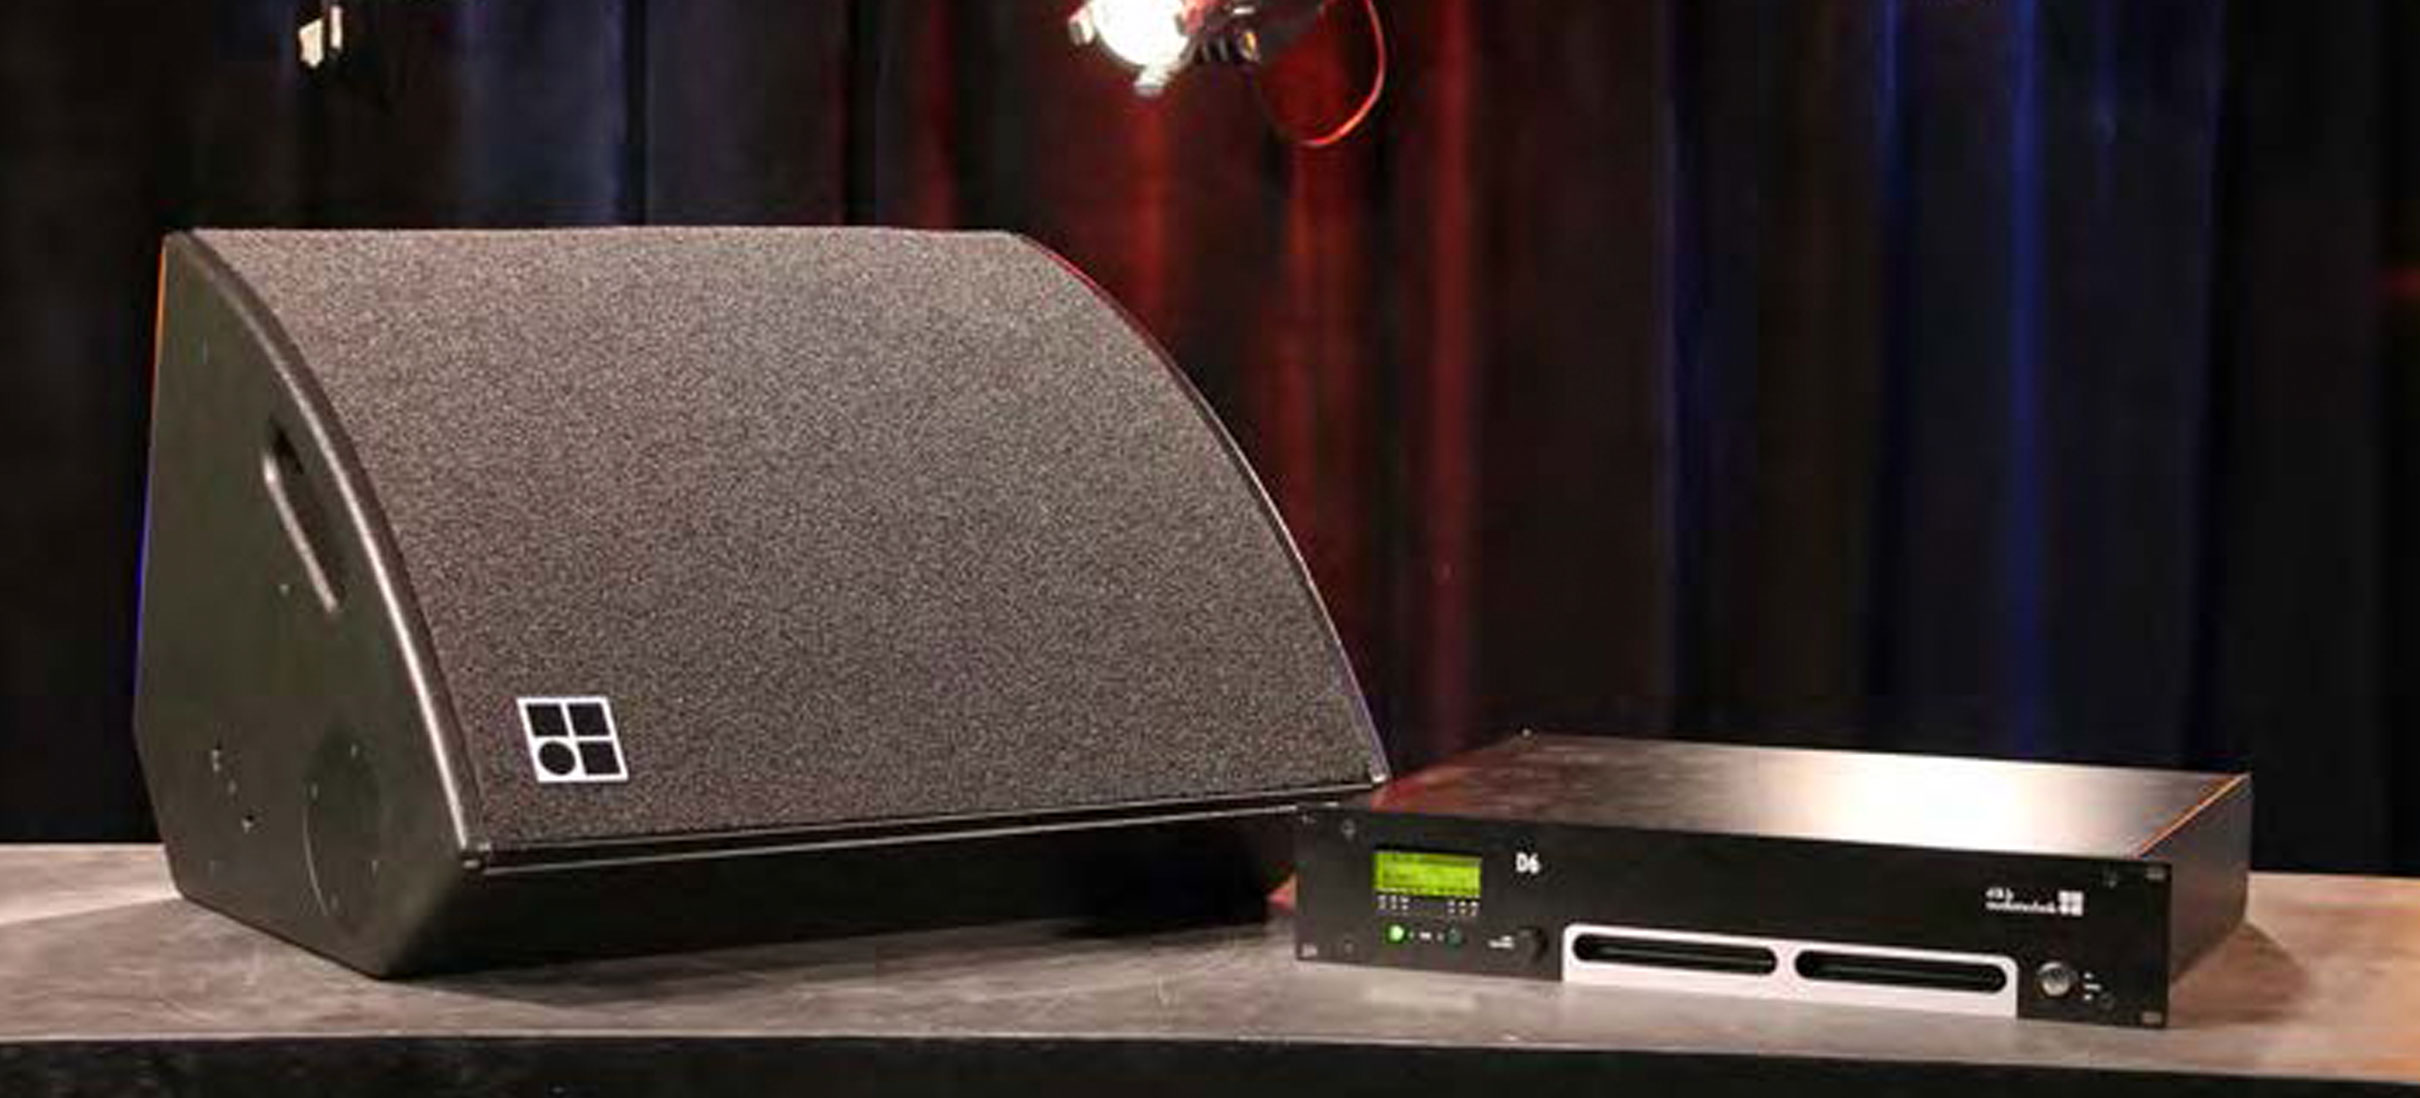 d&b audiotechnik MAX: Review by Jimmy Den-Ouden @ CX Magazine